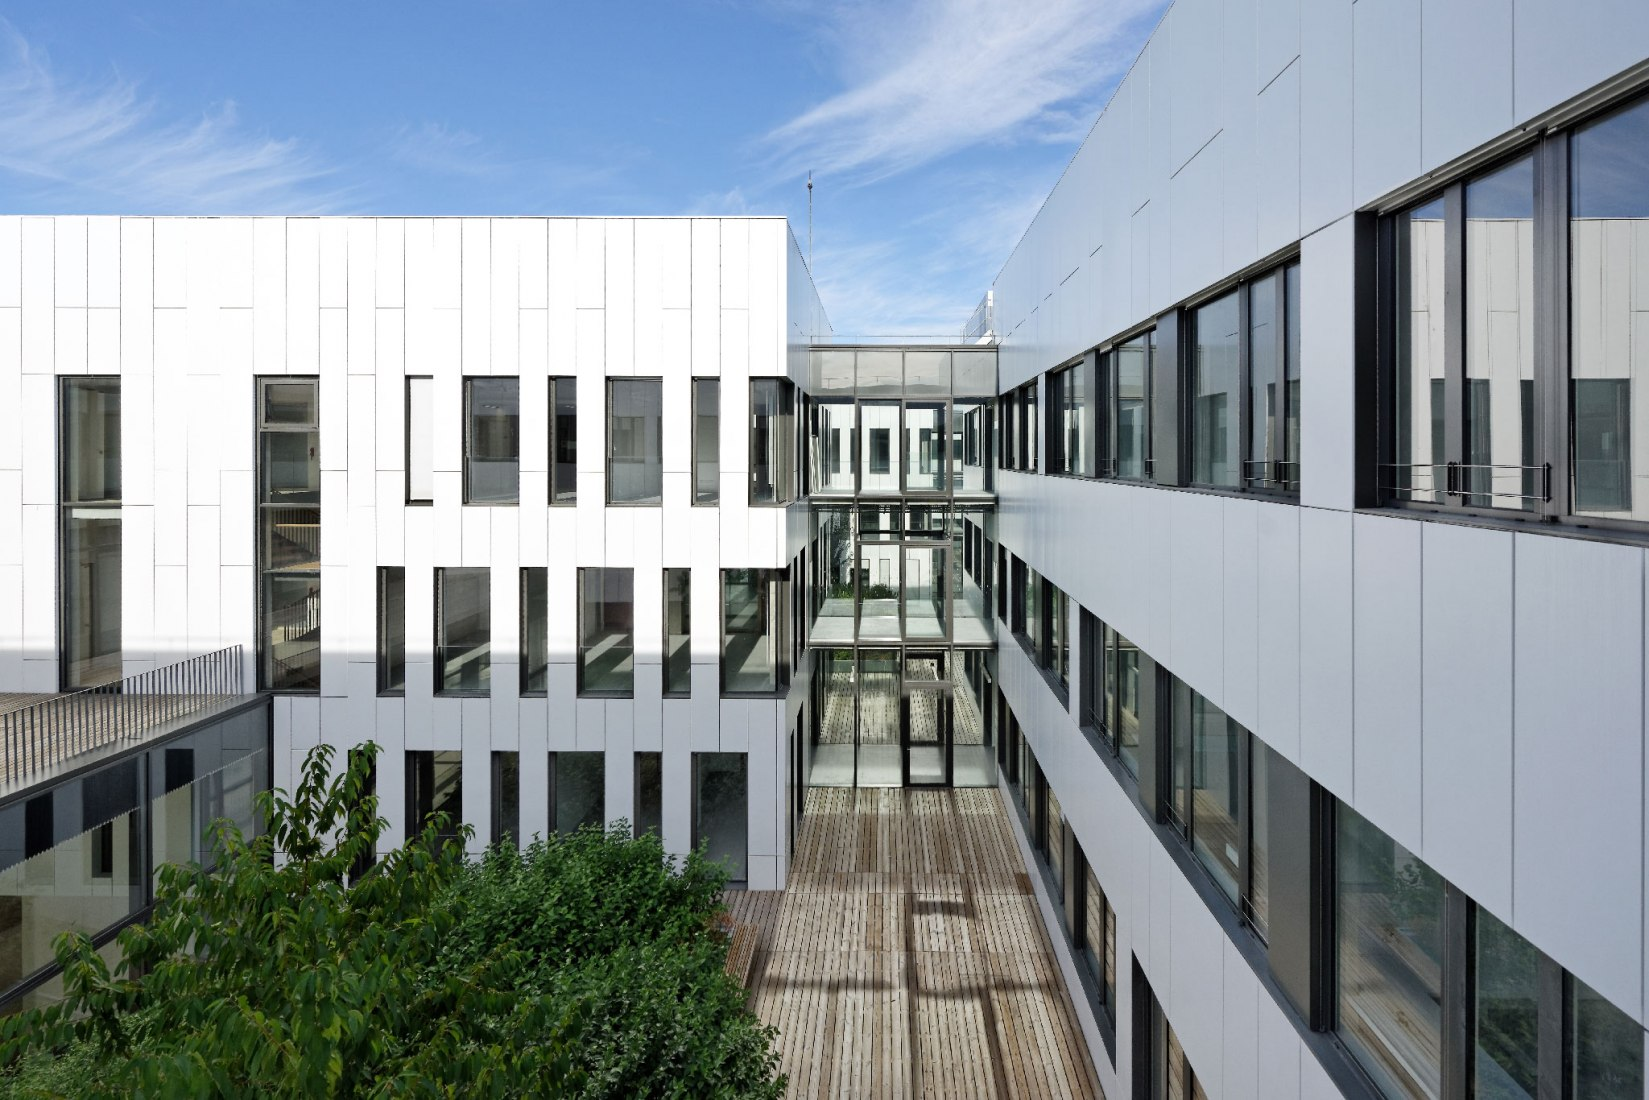 Entre yardas. Instituto de Neurociencia por Dietmar Feichtinger Architectes